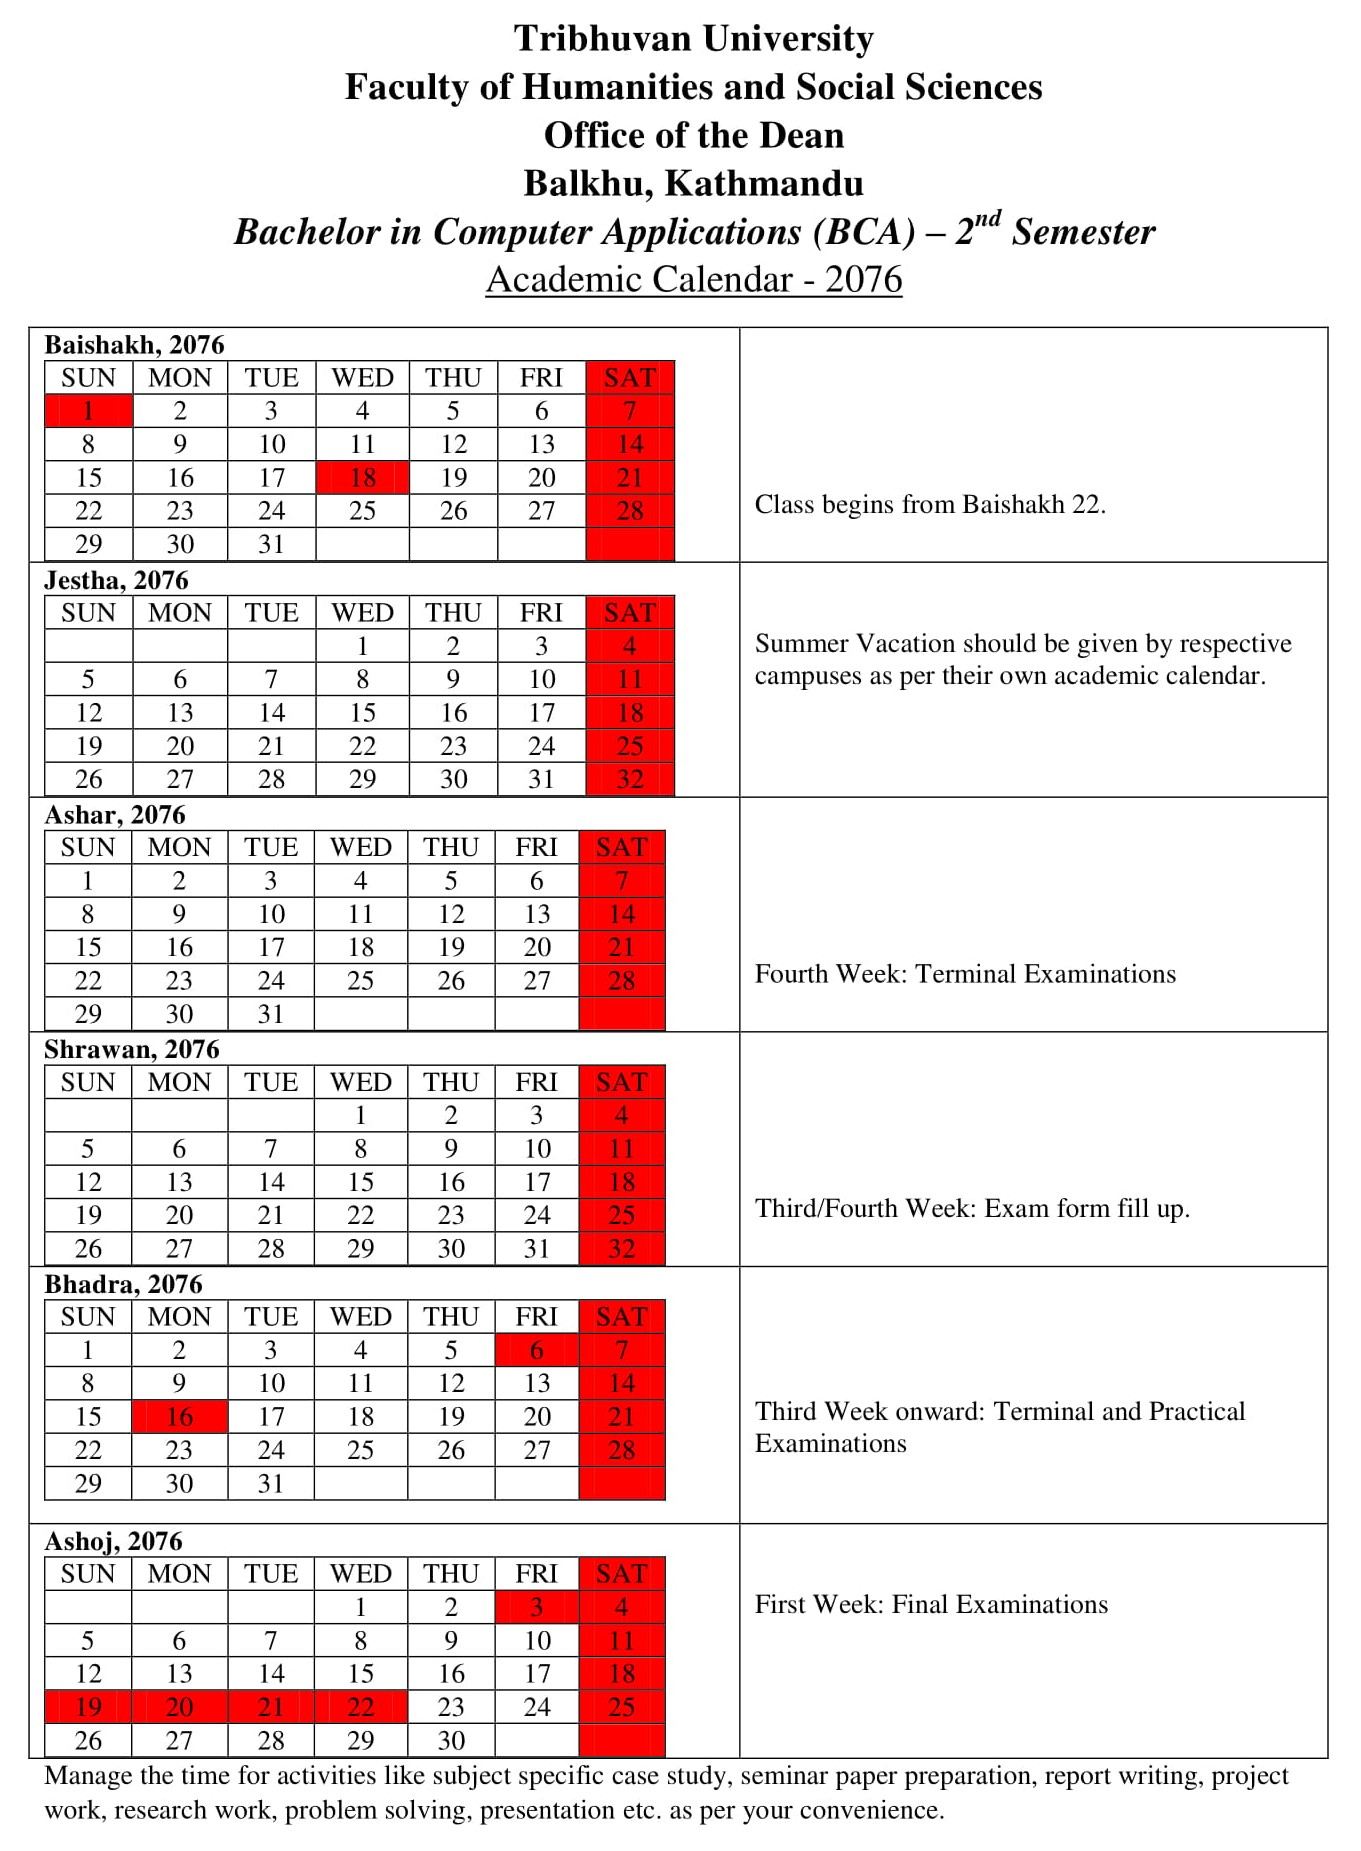 Terminal 5 Calendar.Bca Second Semester Academic Calendar 2076 Tribhuvan University